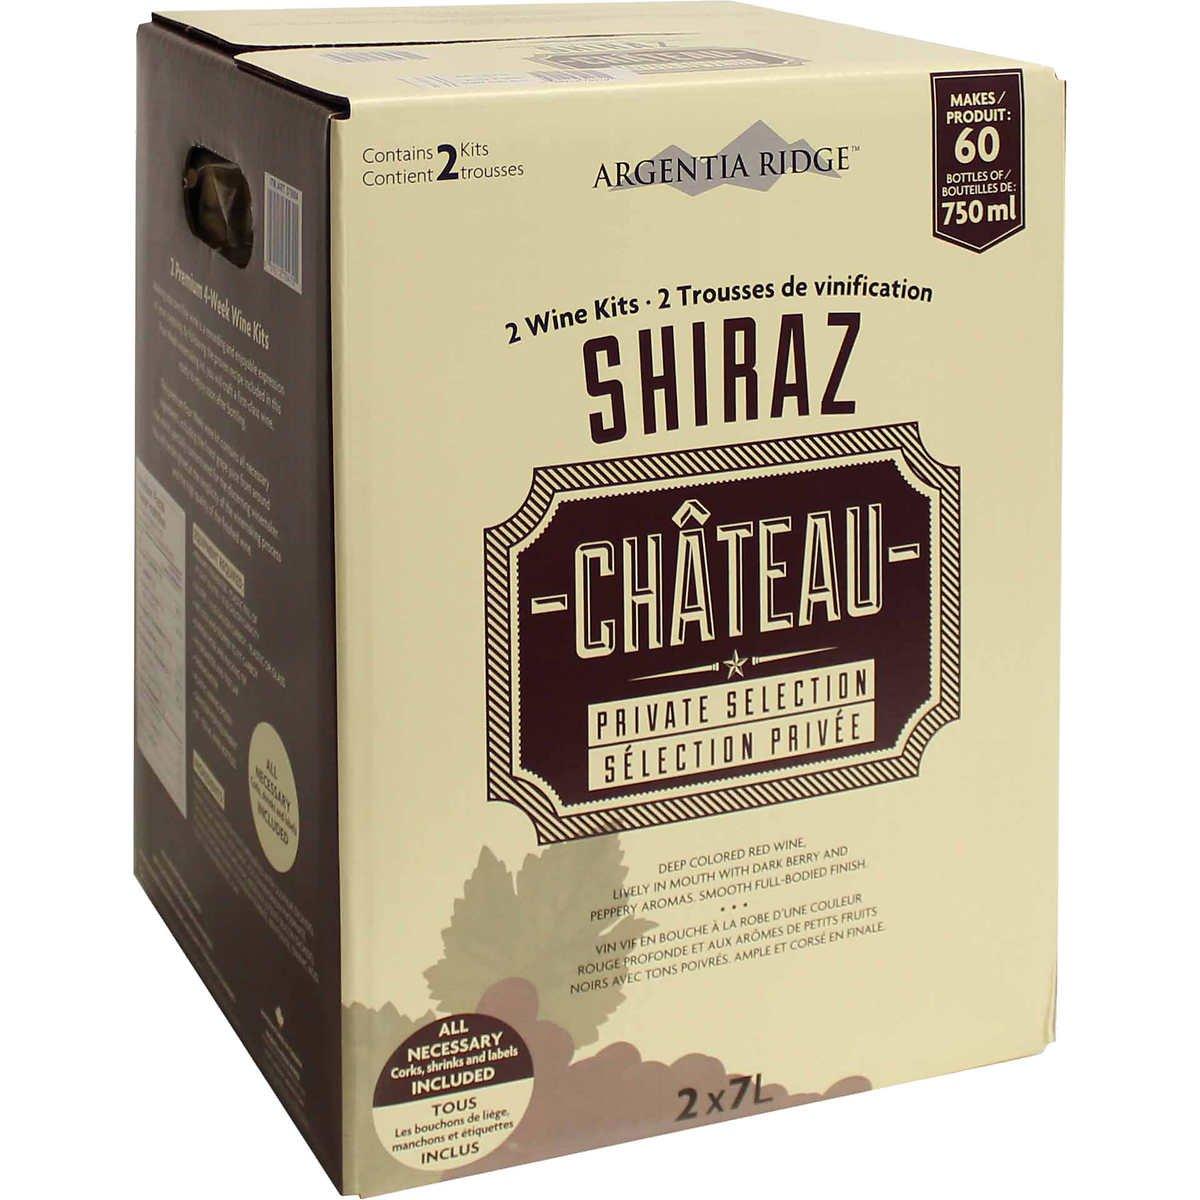 Argentia Ridge Château Private Selection Wine Kit (Shiraz)